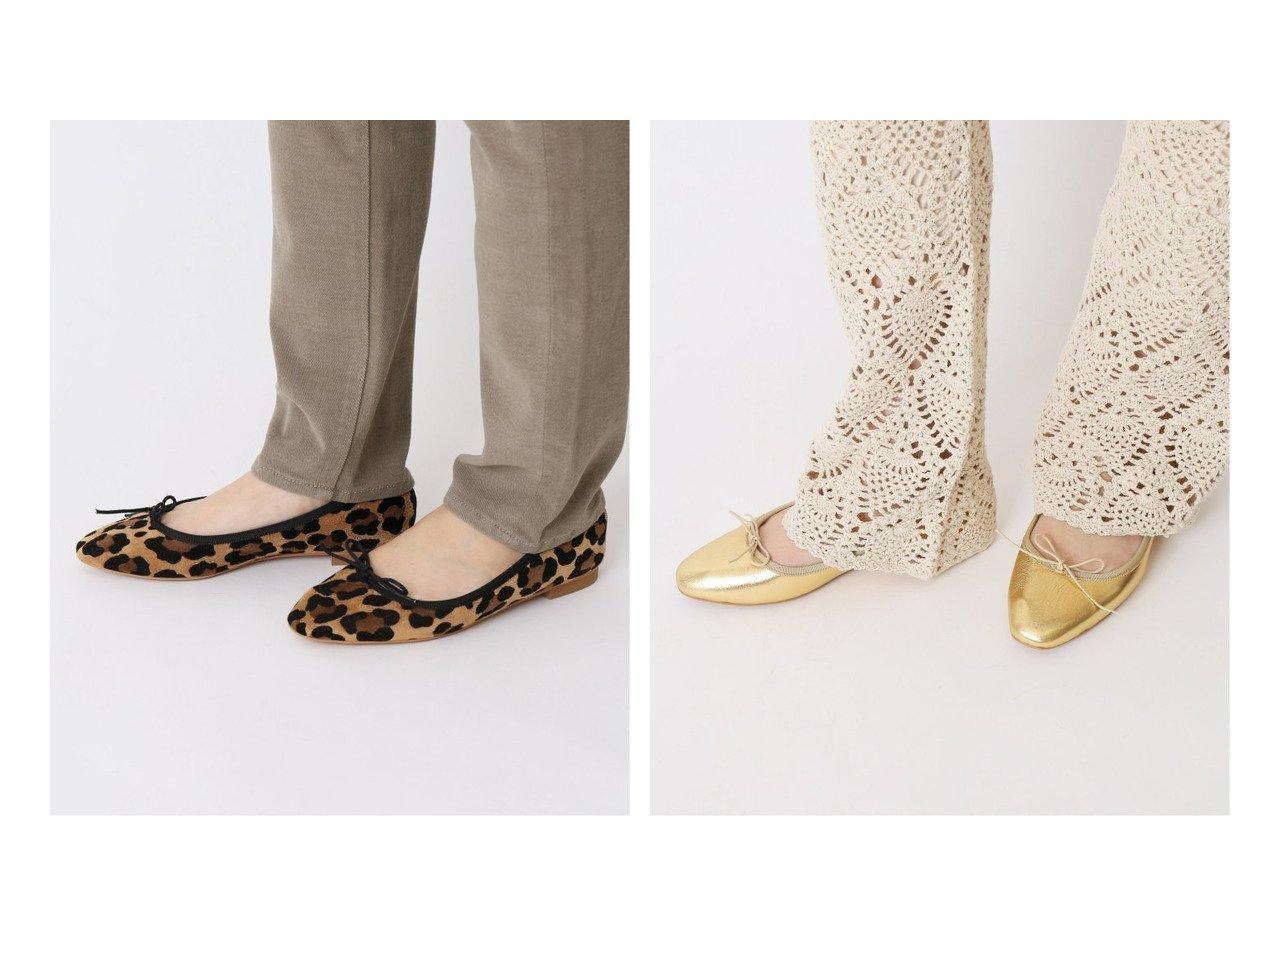 【U by Spick&Span/ユーバイ スピック&スパン】のORIGINAL バレーシューズ シューズ・靴のおすすめ!人気、トレンド・レディースファッションの通販 おすすめで人気の流行・トレンド、ファッションの通販商品 メンズファッション・キッズファッション・インテリア・家具・レディースファッション・服の通販 founy(ファニー) https://founy.com/ ファッション Fashion レディースファッション WOMEN 2021年 2021 2021 春夏 S/S SS Spring/Summer 2021 S/S 春夏 SS Spring/Summer シューズ バレエ レオパード 春 Spring |ID:crp329100000022542